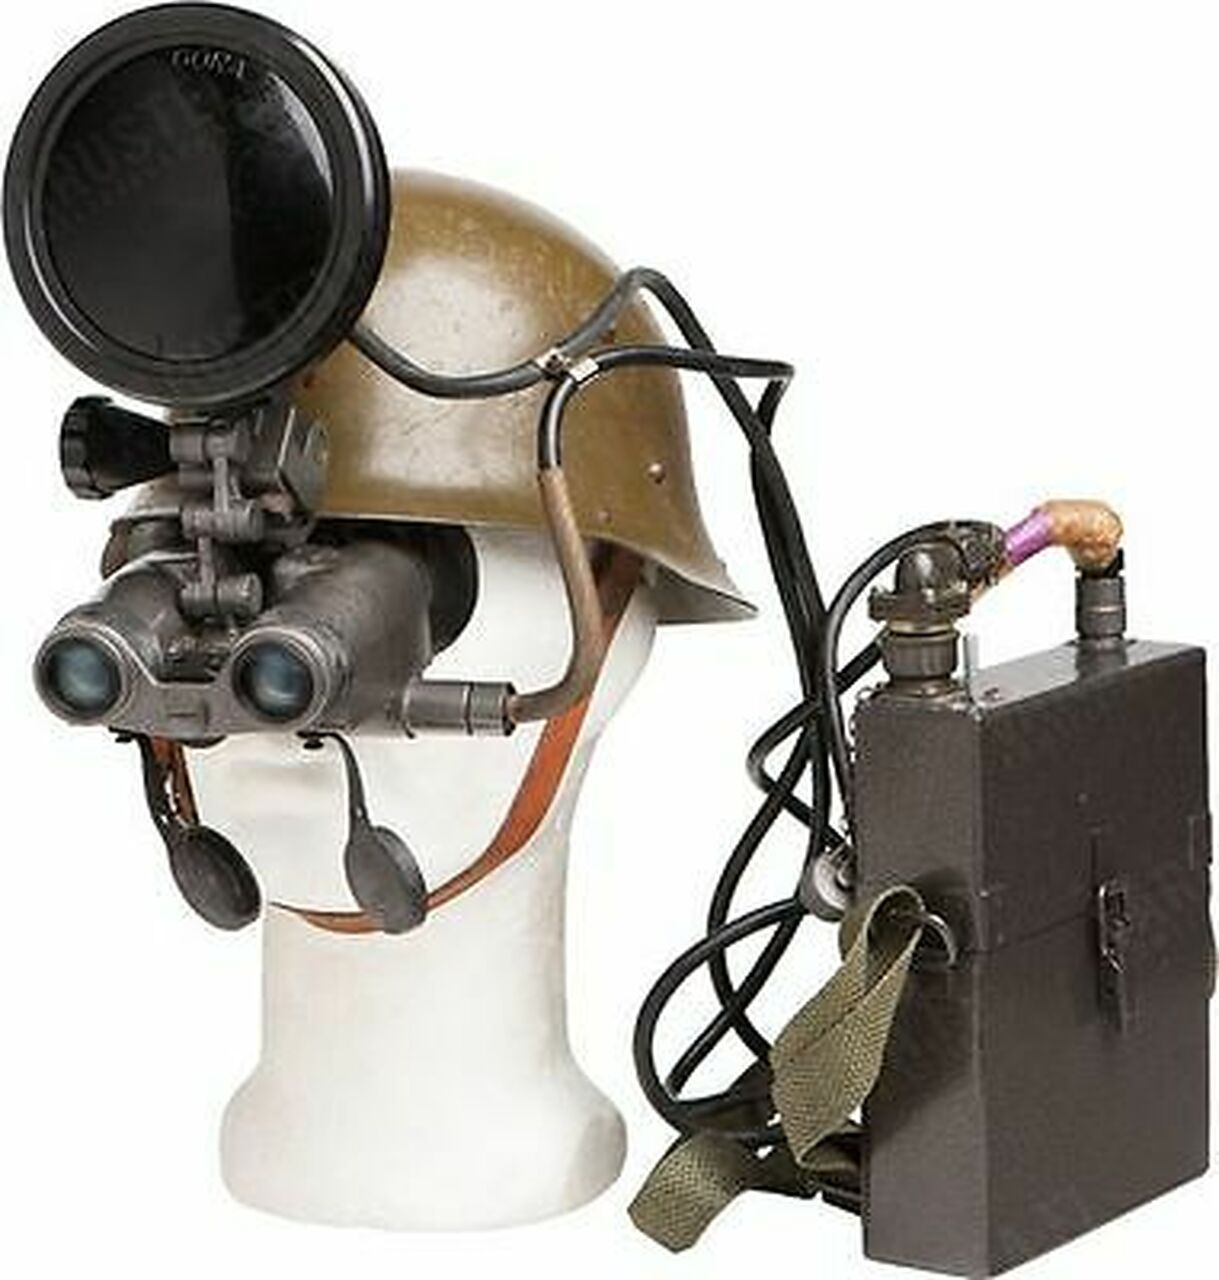 Sell Us Your Used Optics!